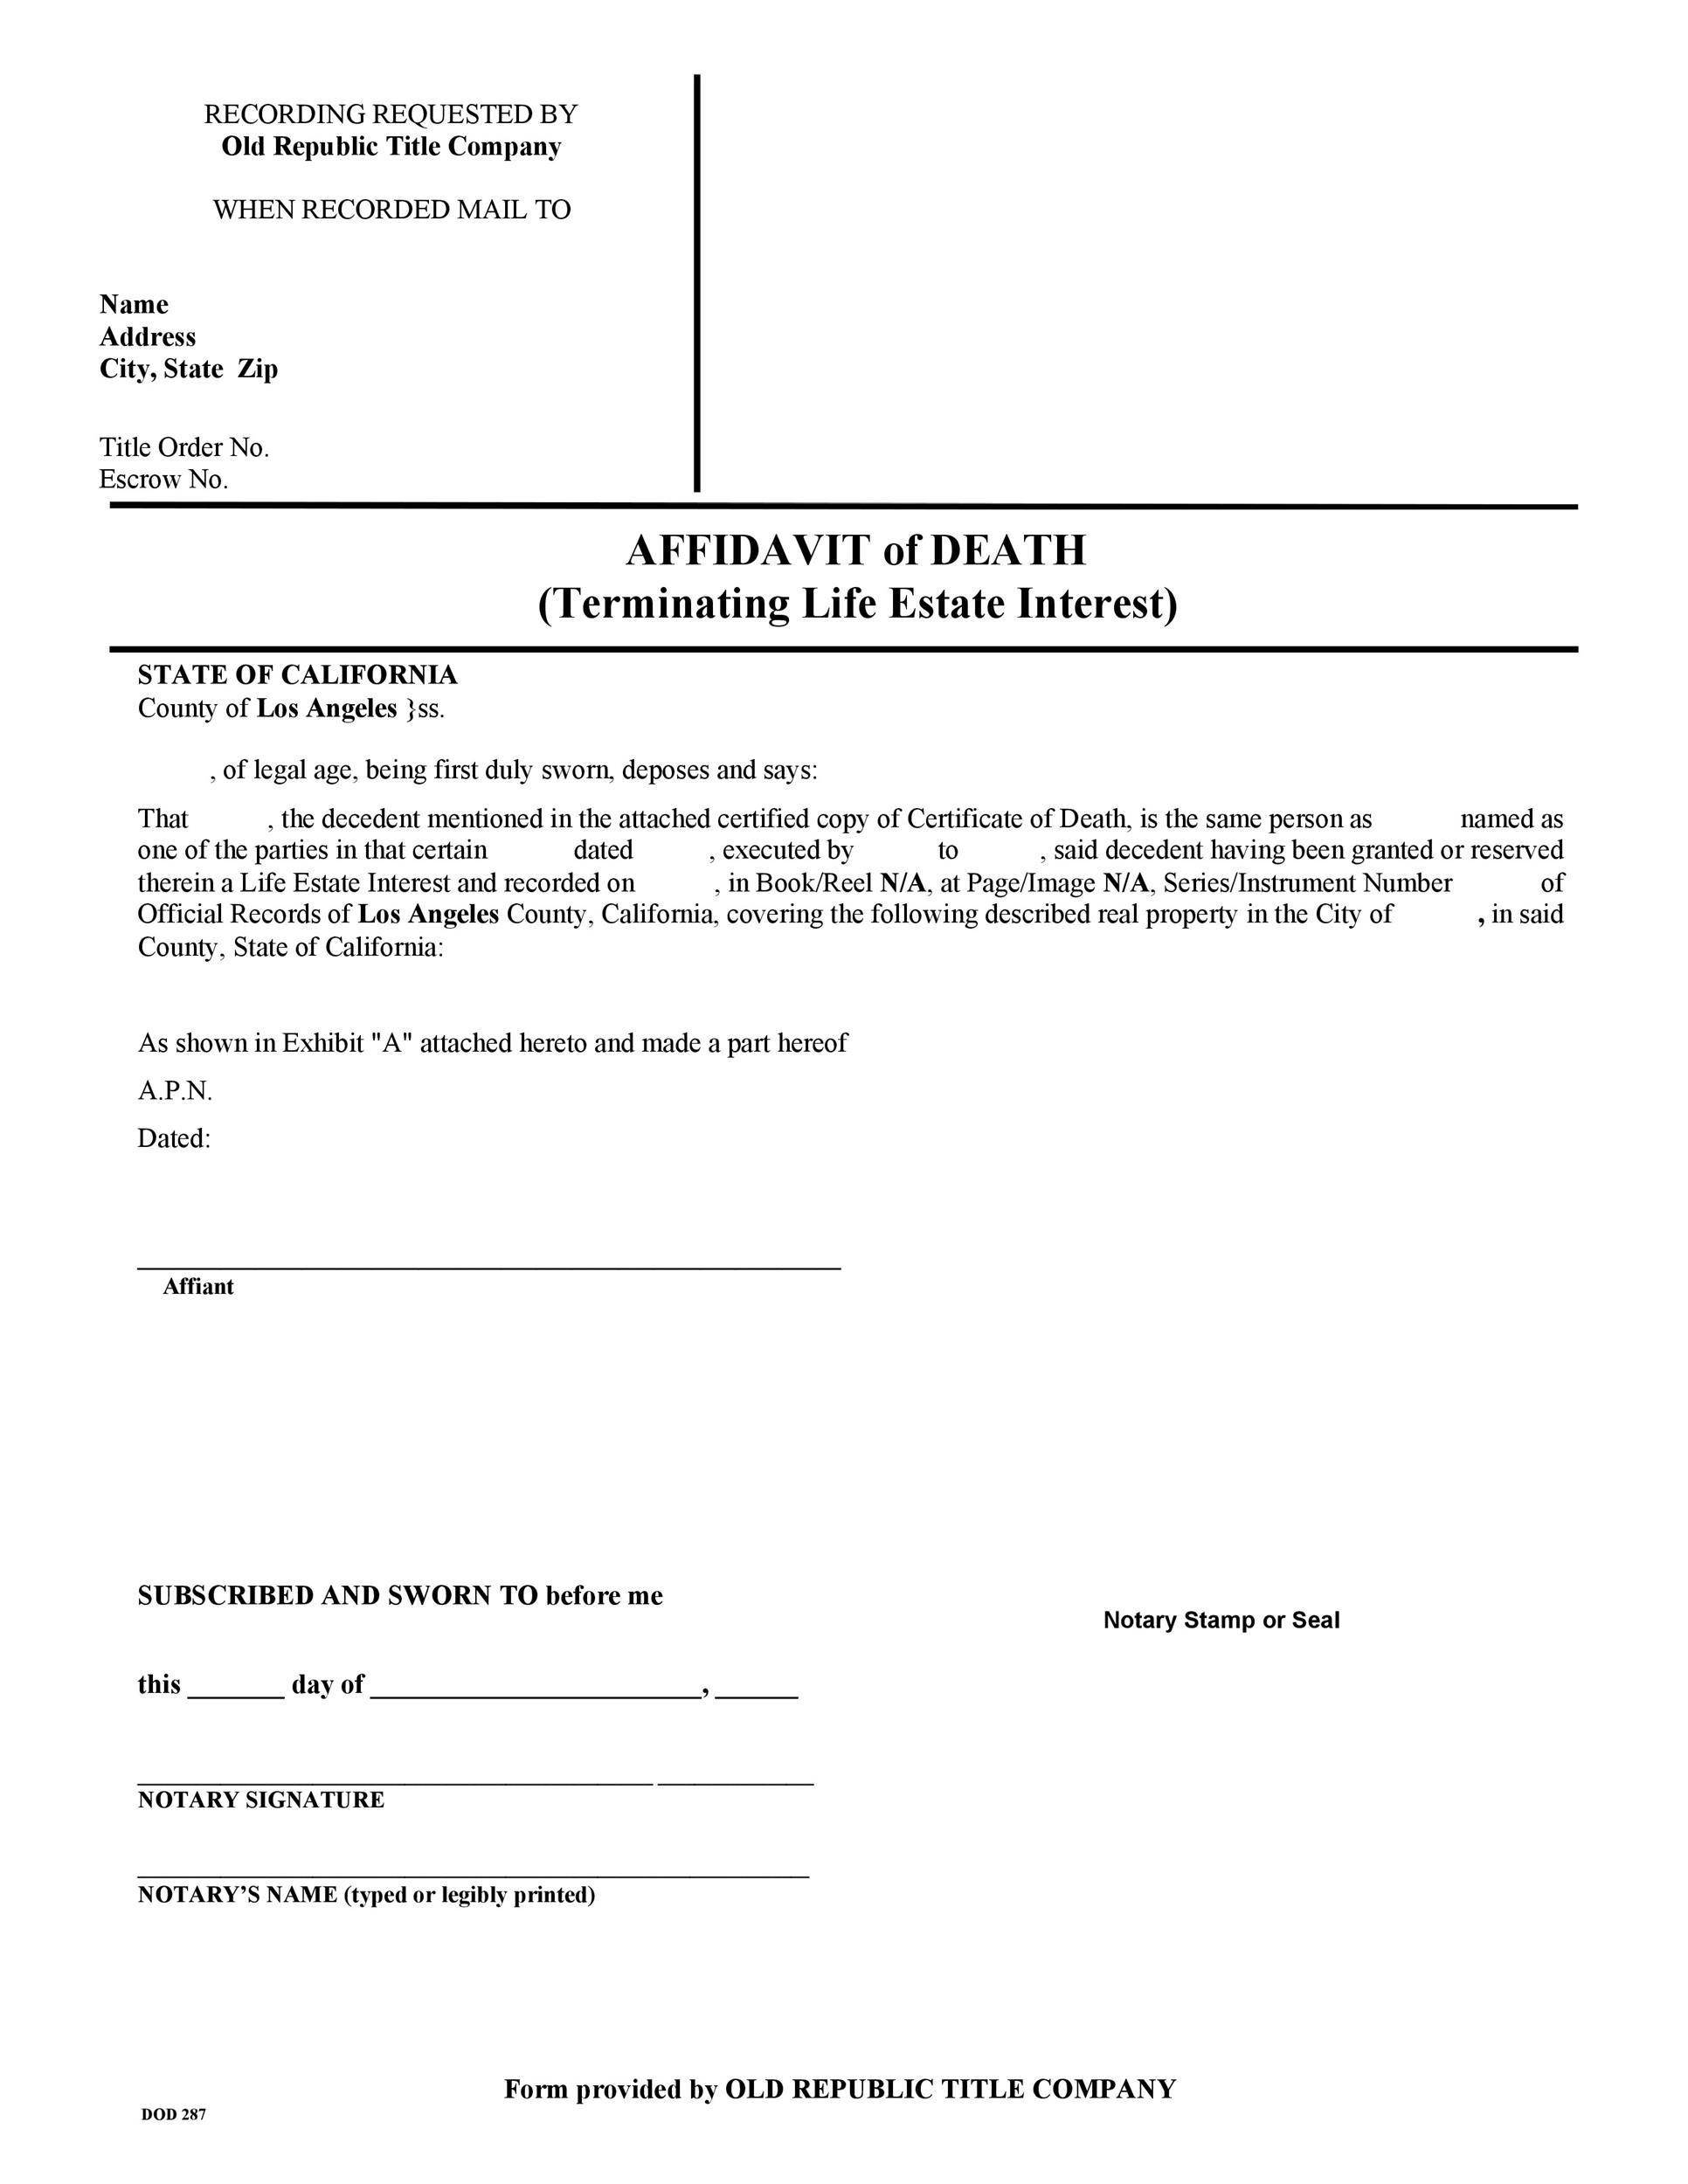 Free affidavit of death 07